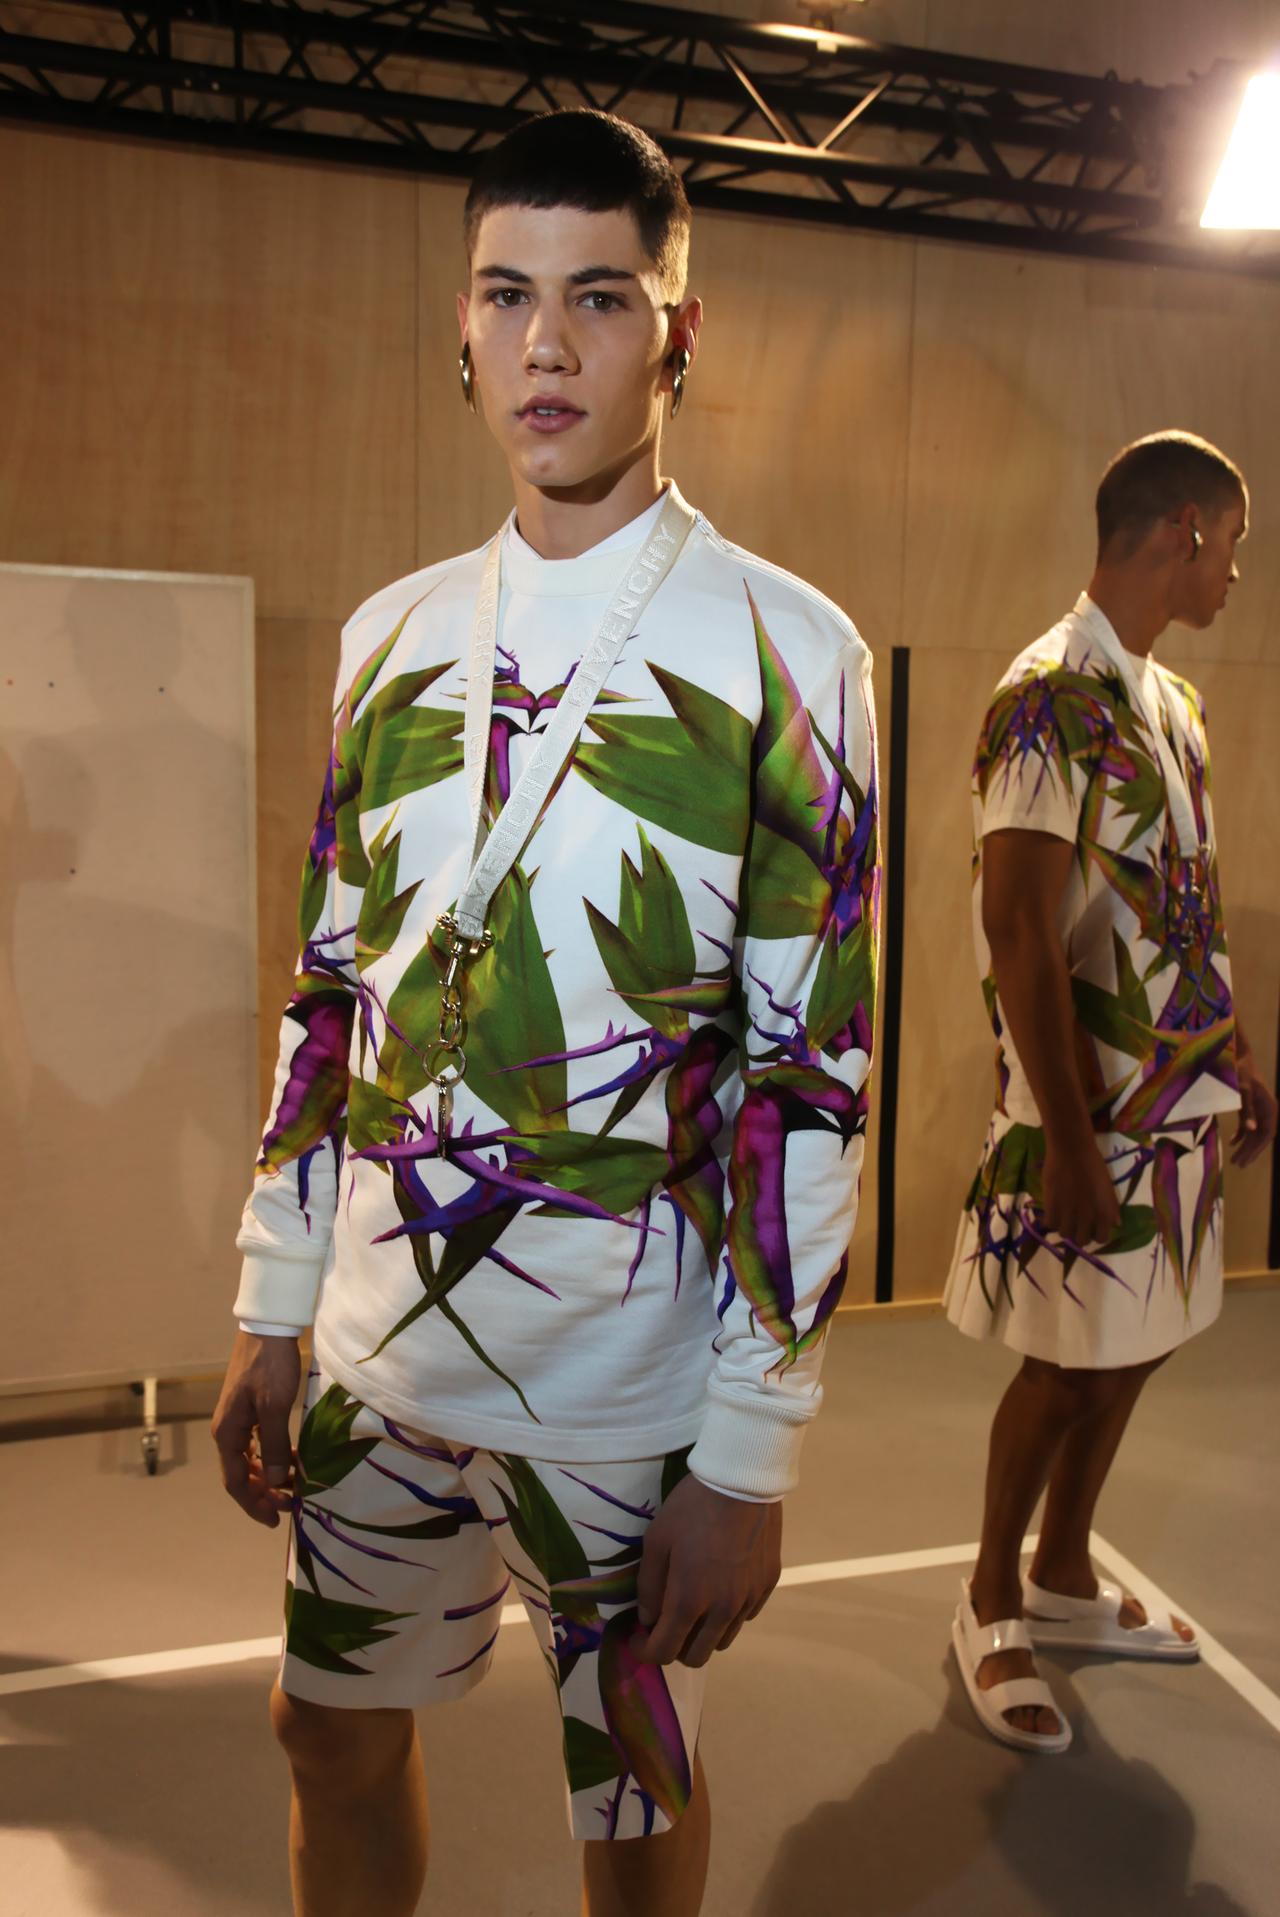 vuittonv:    Friday, June 29: Givenchy Menswear Spring/Summer 2013